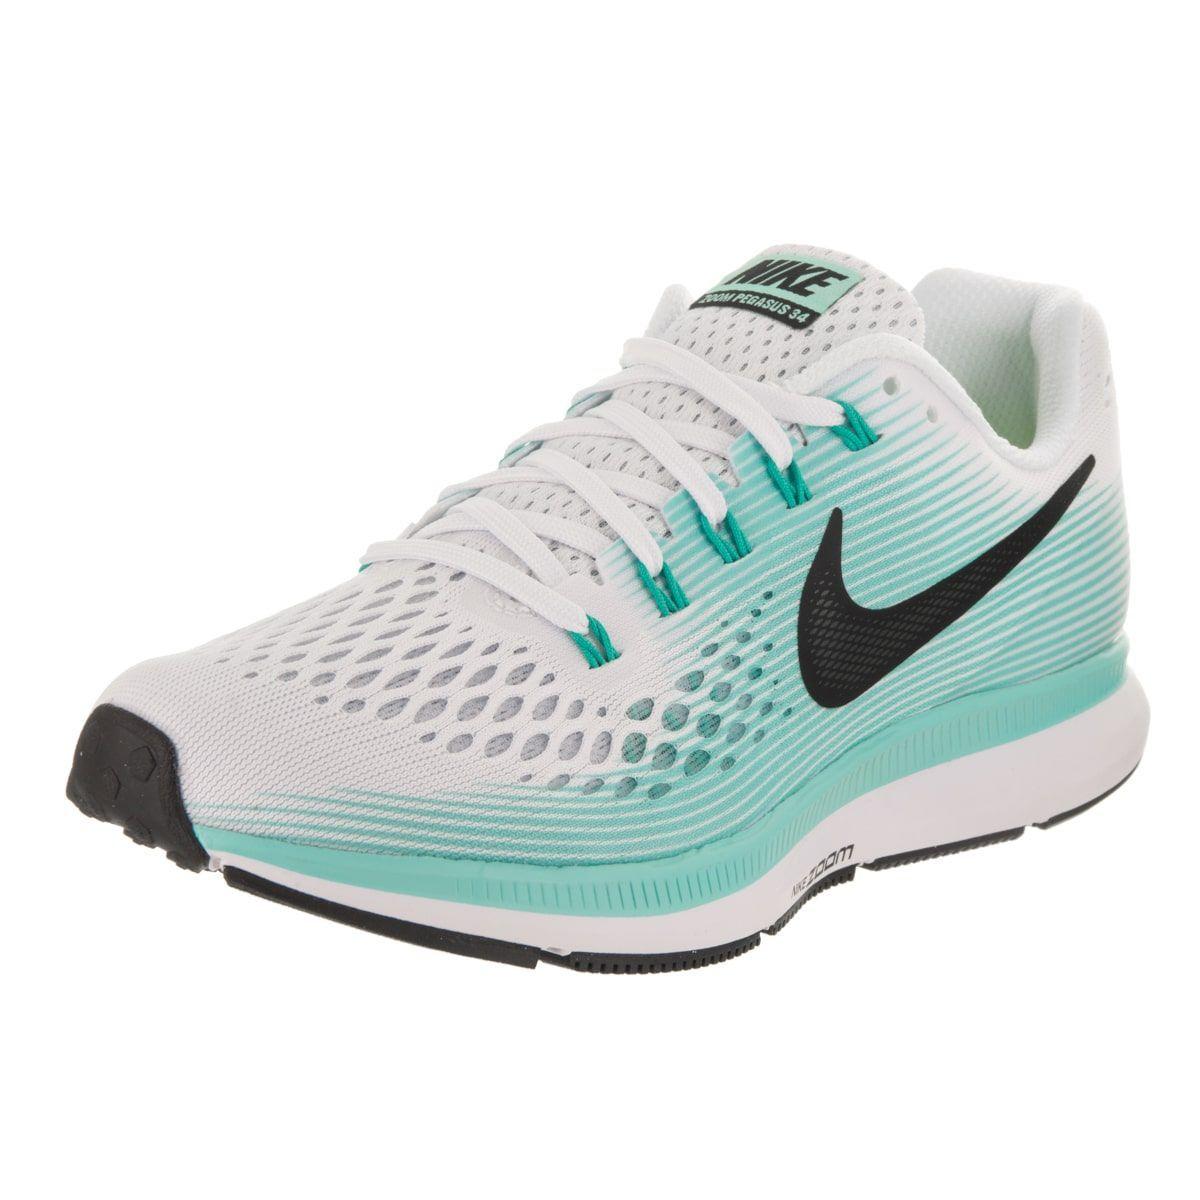 best sneakers f749f 23928 Nike Women's Air Zoom Pegasus 34 Running Shoe | Shoe | Shoes ...